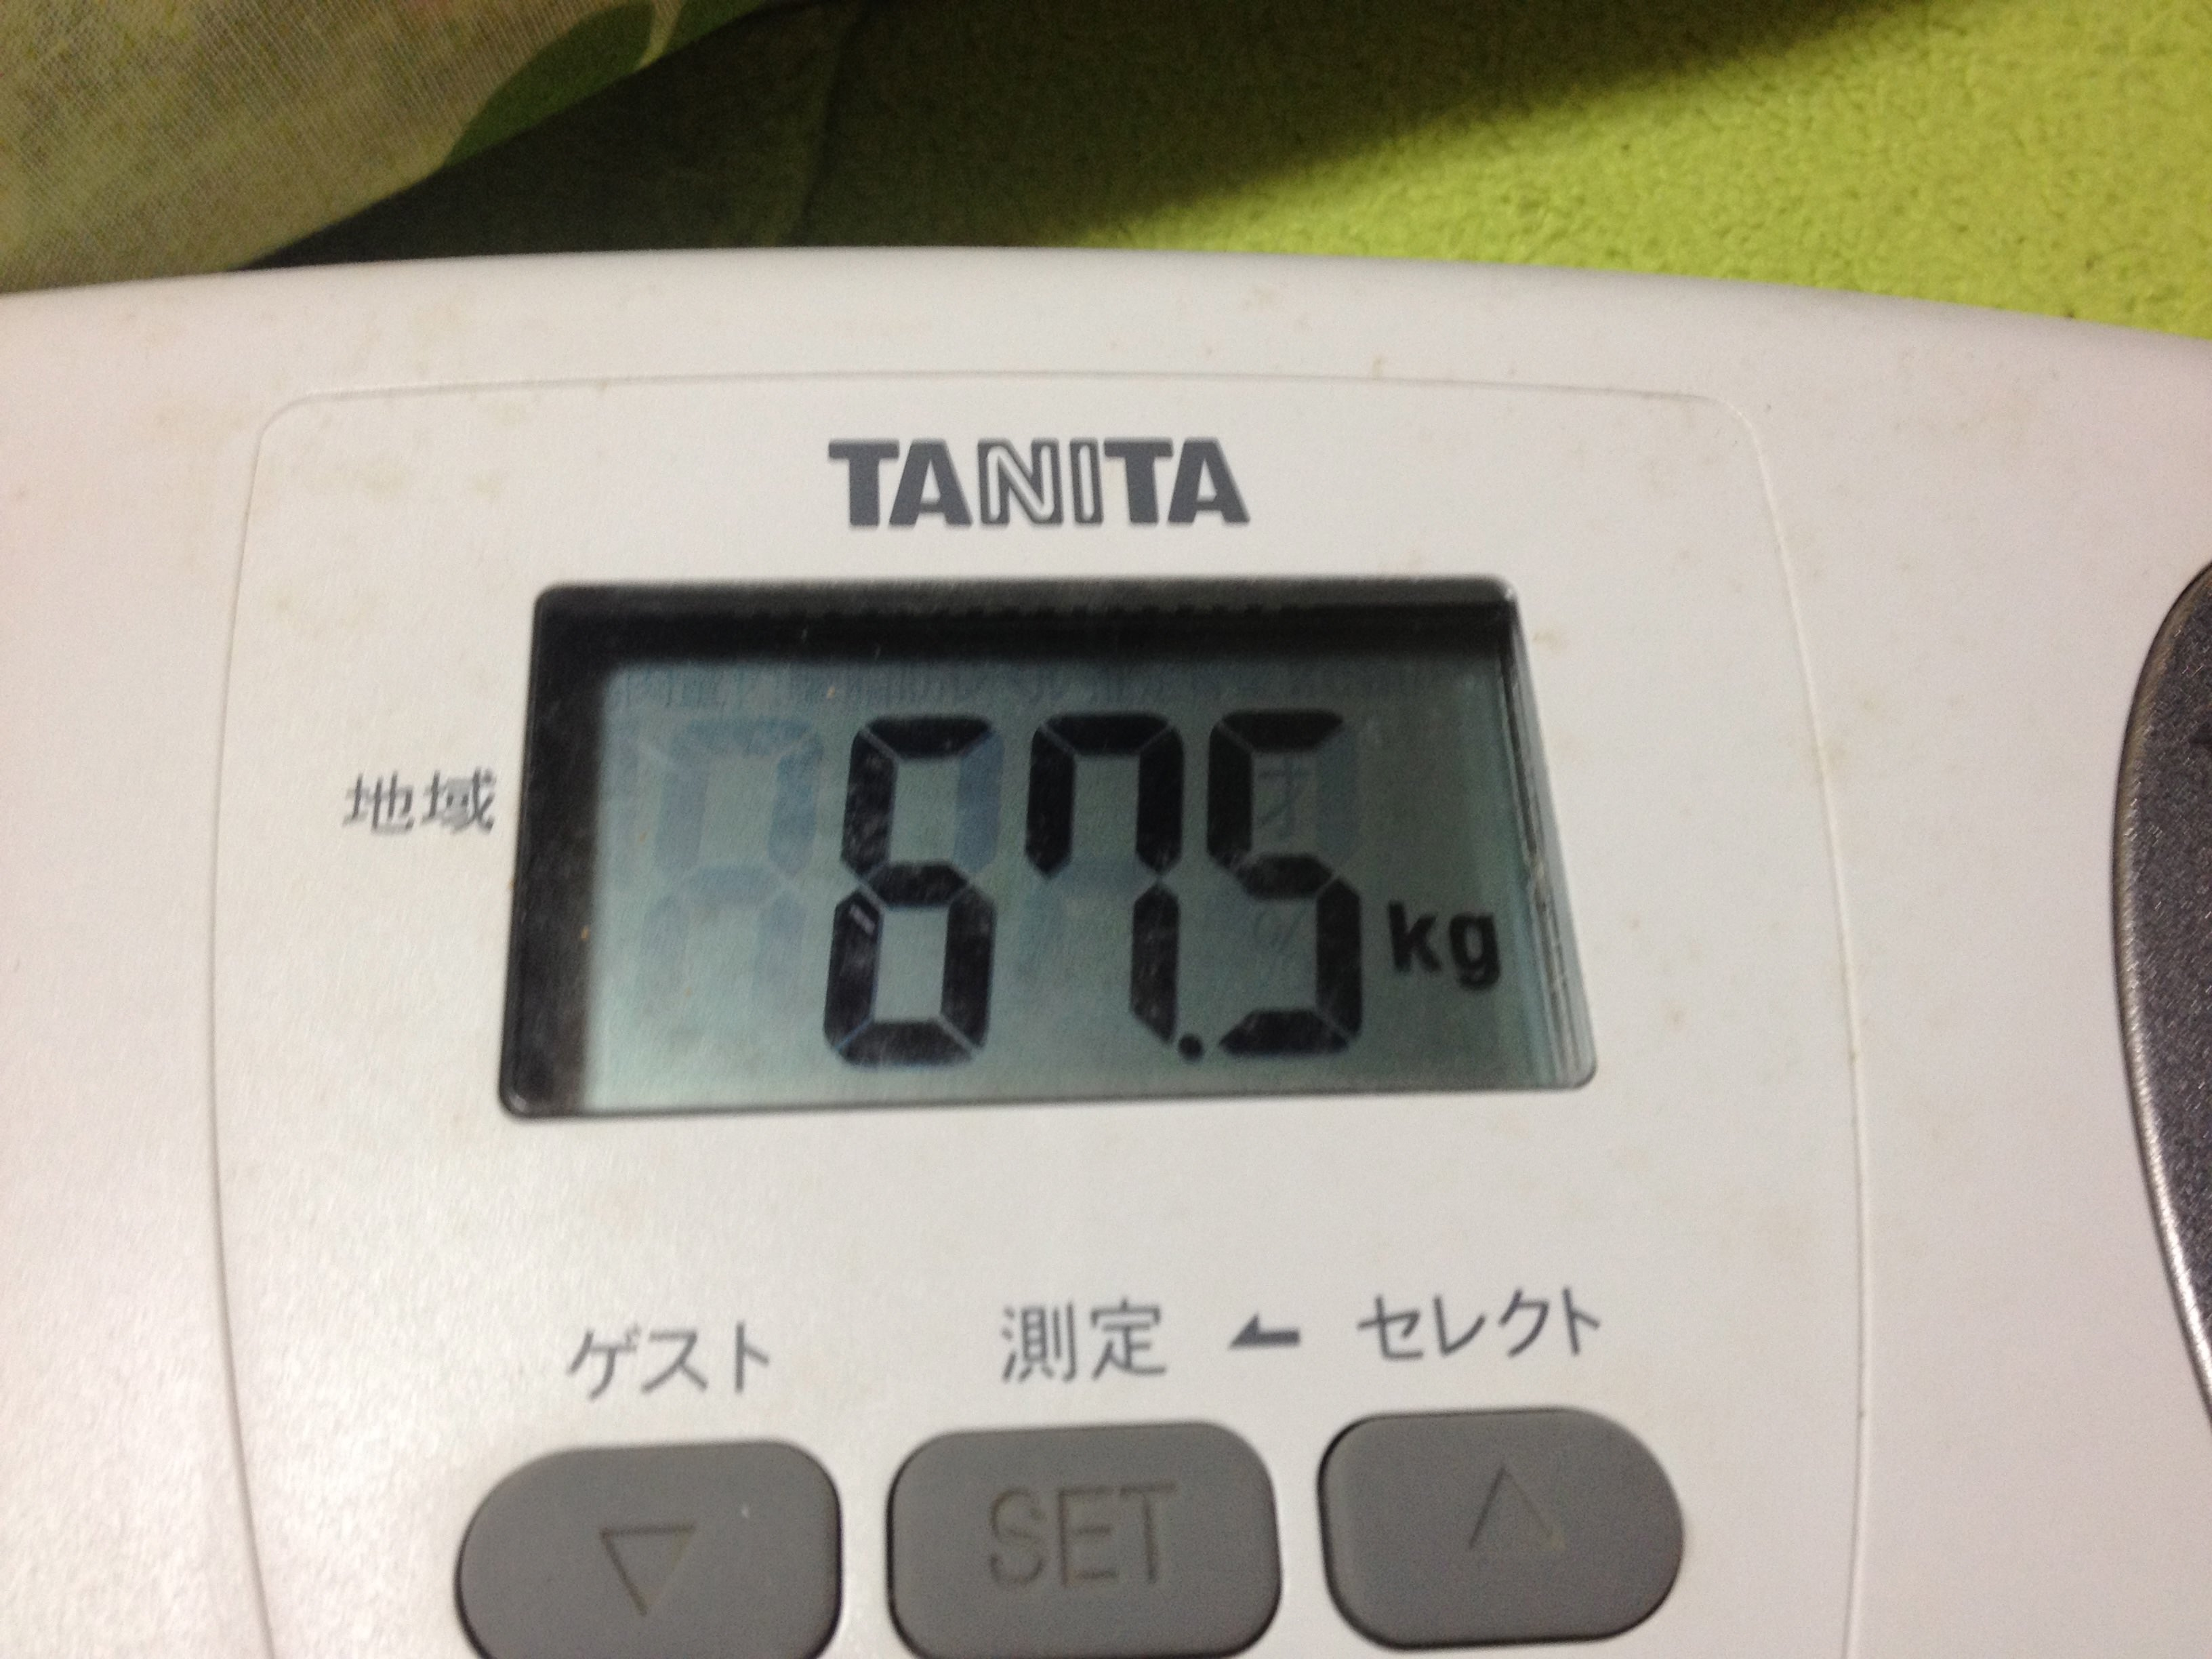 TANITAの体重計で体重を計測しました。